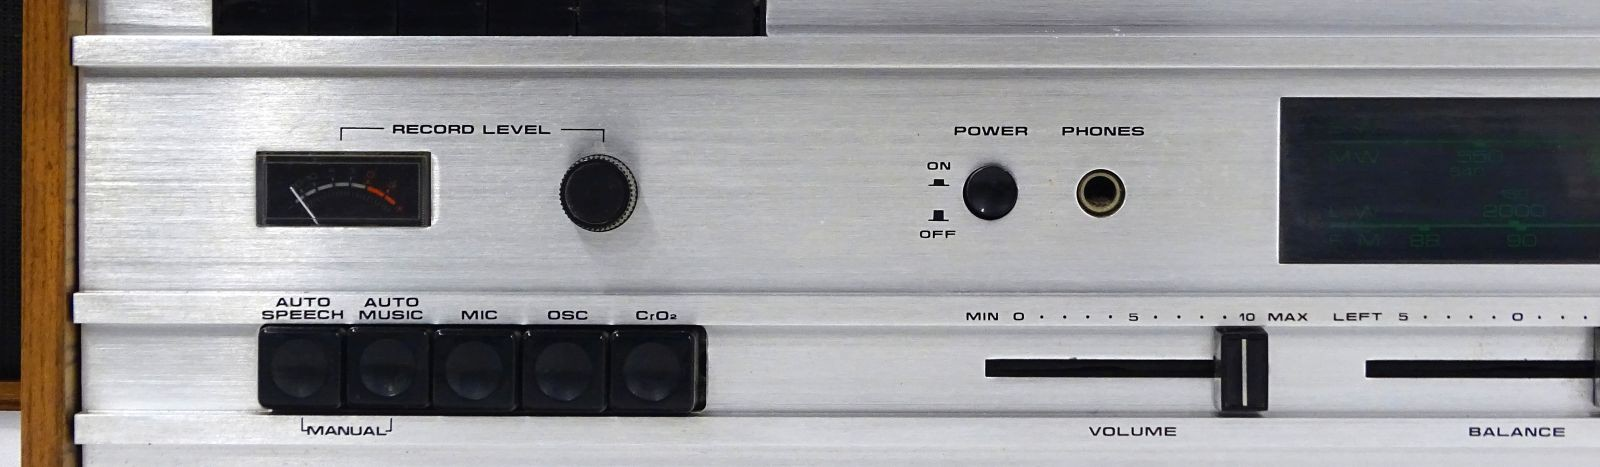 DSC06982.JPG (1600×467)